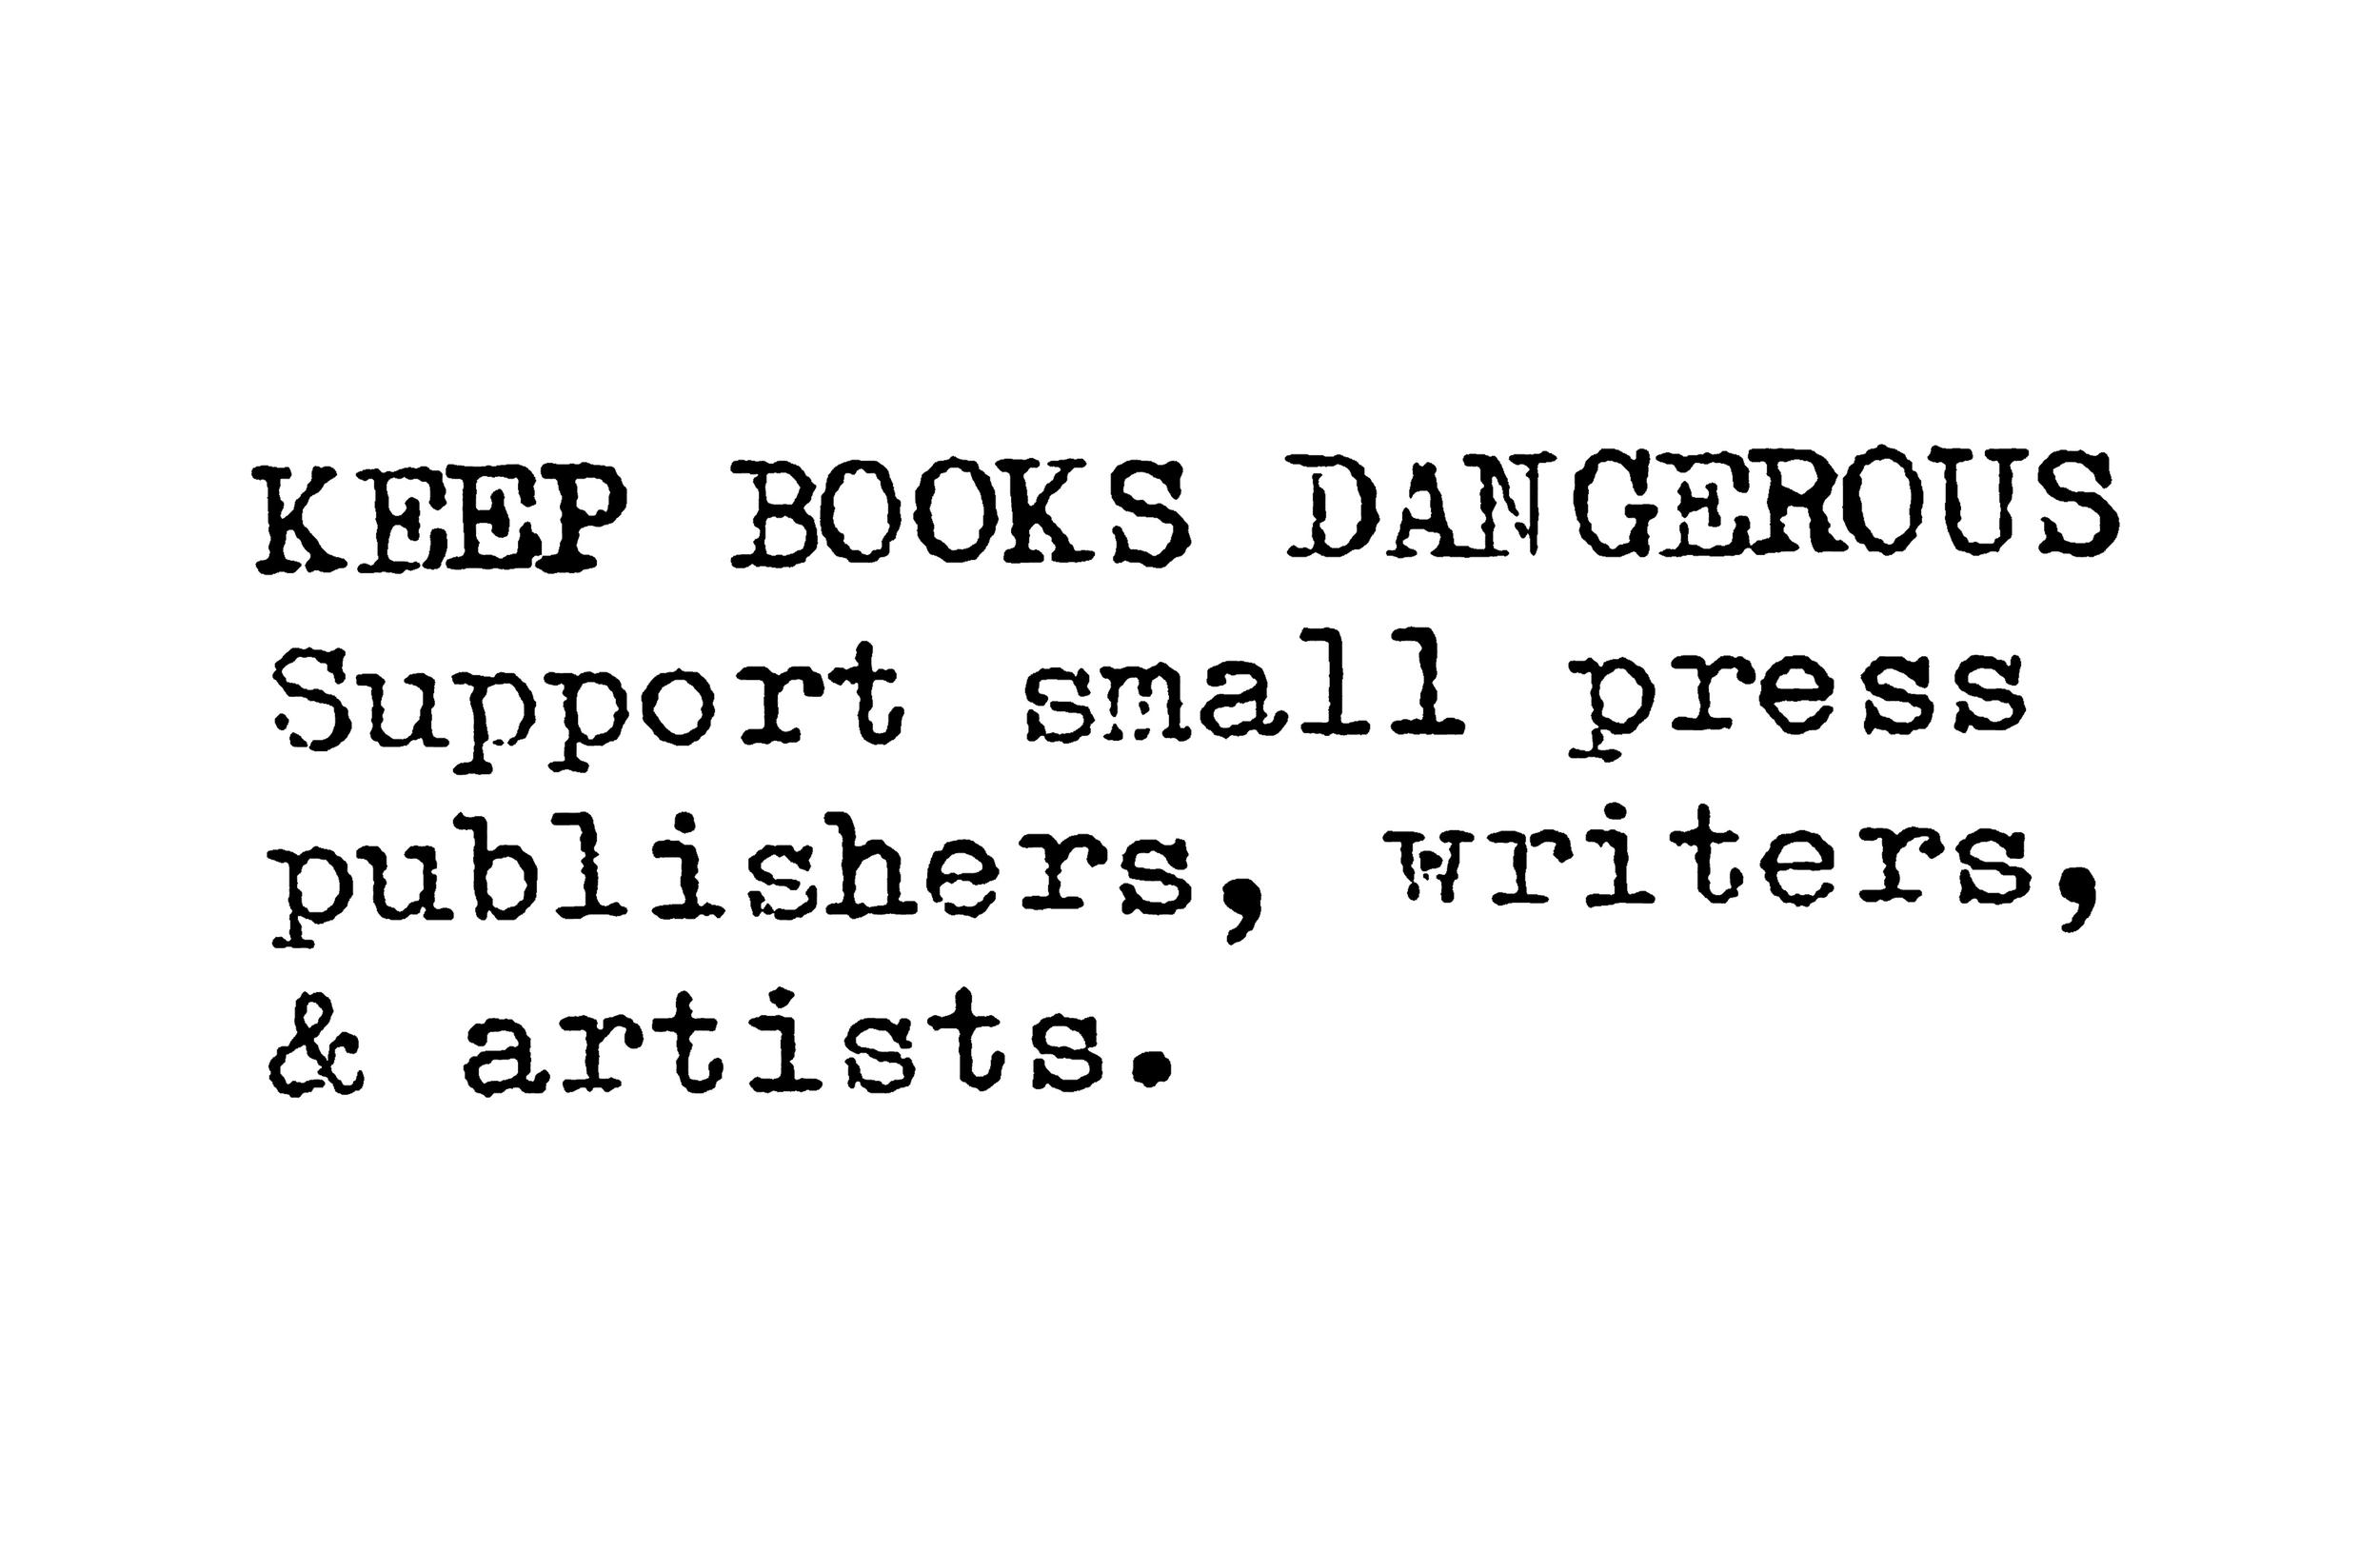 KEEP BOOKS DANGEROUS